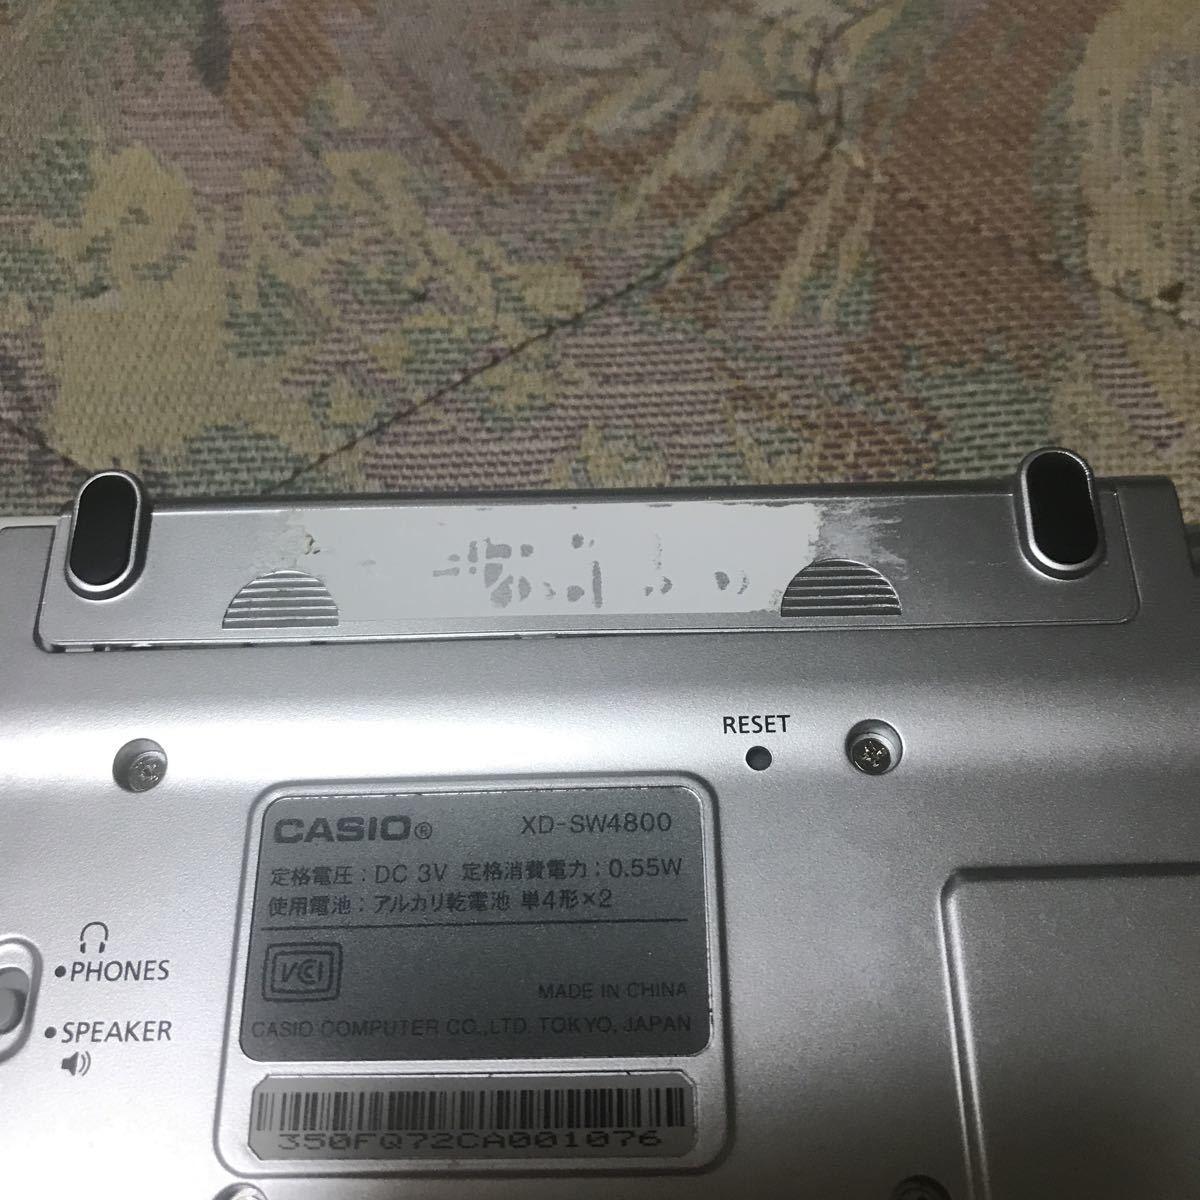 CASIO EX-word DATAPLUS 3 XD-SW4800 タッチペン、イヤホン、ケース付属_画像2